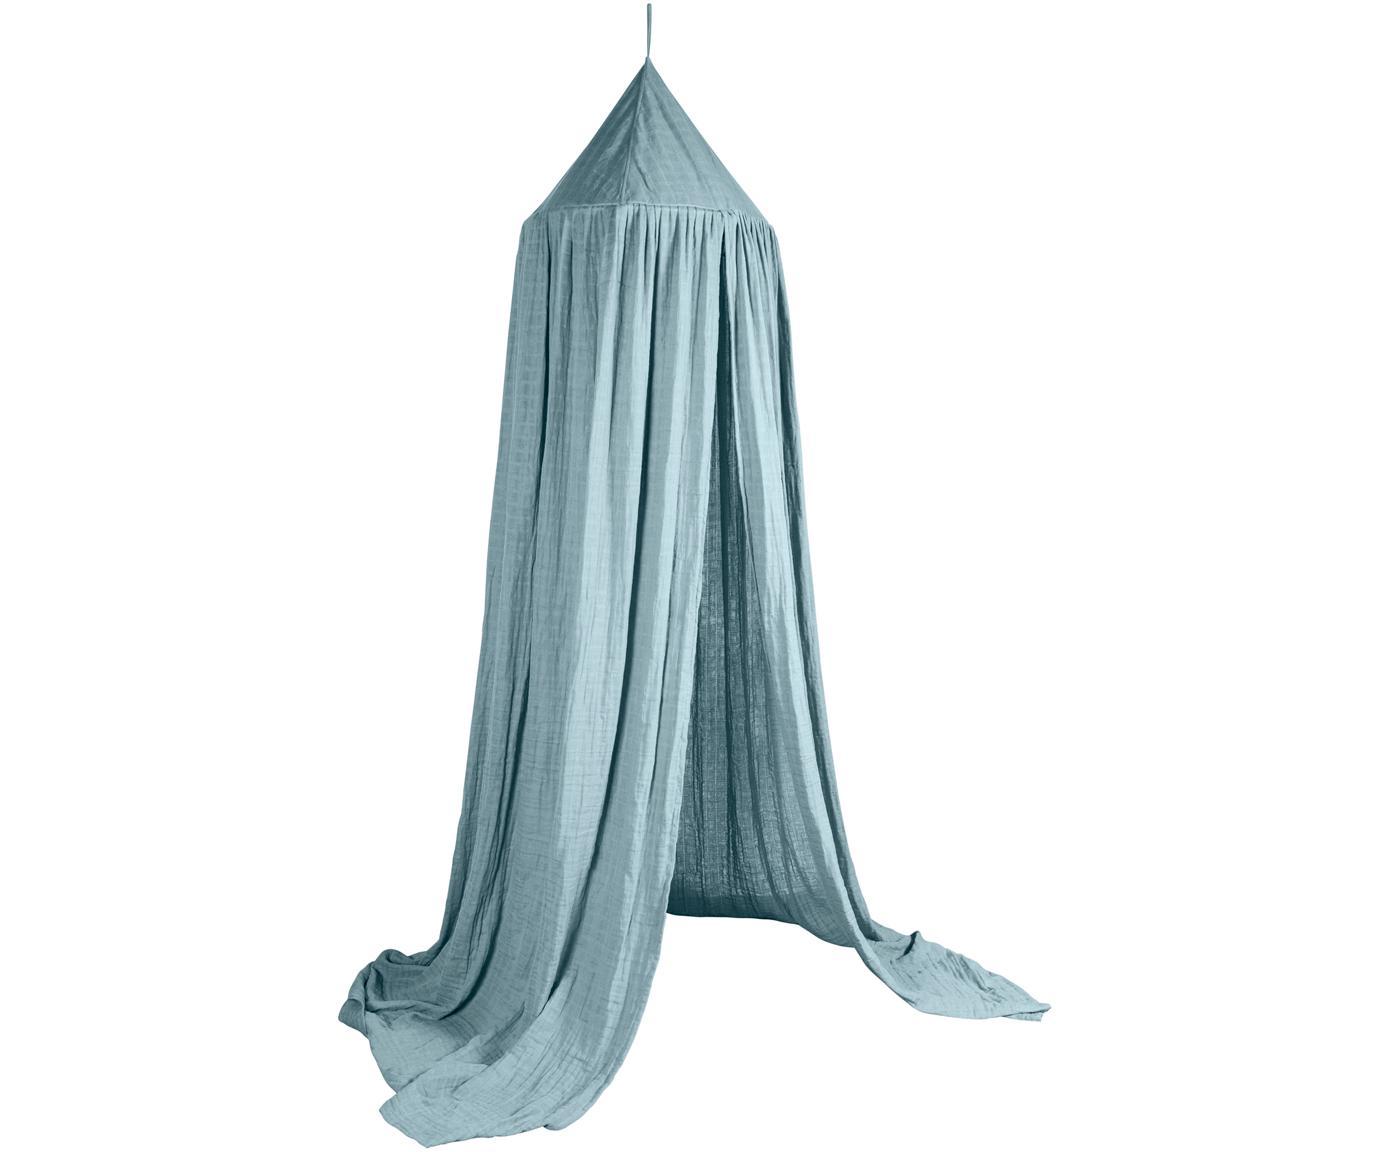 Betthimmel Stars, Bezug: Baumwolle, Blau, Ø 52 x H 240 cm